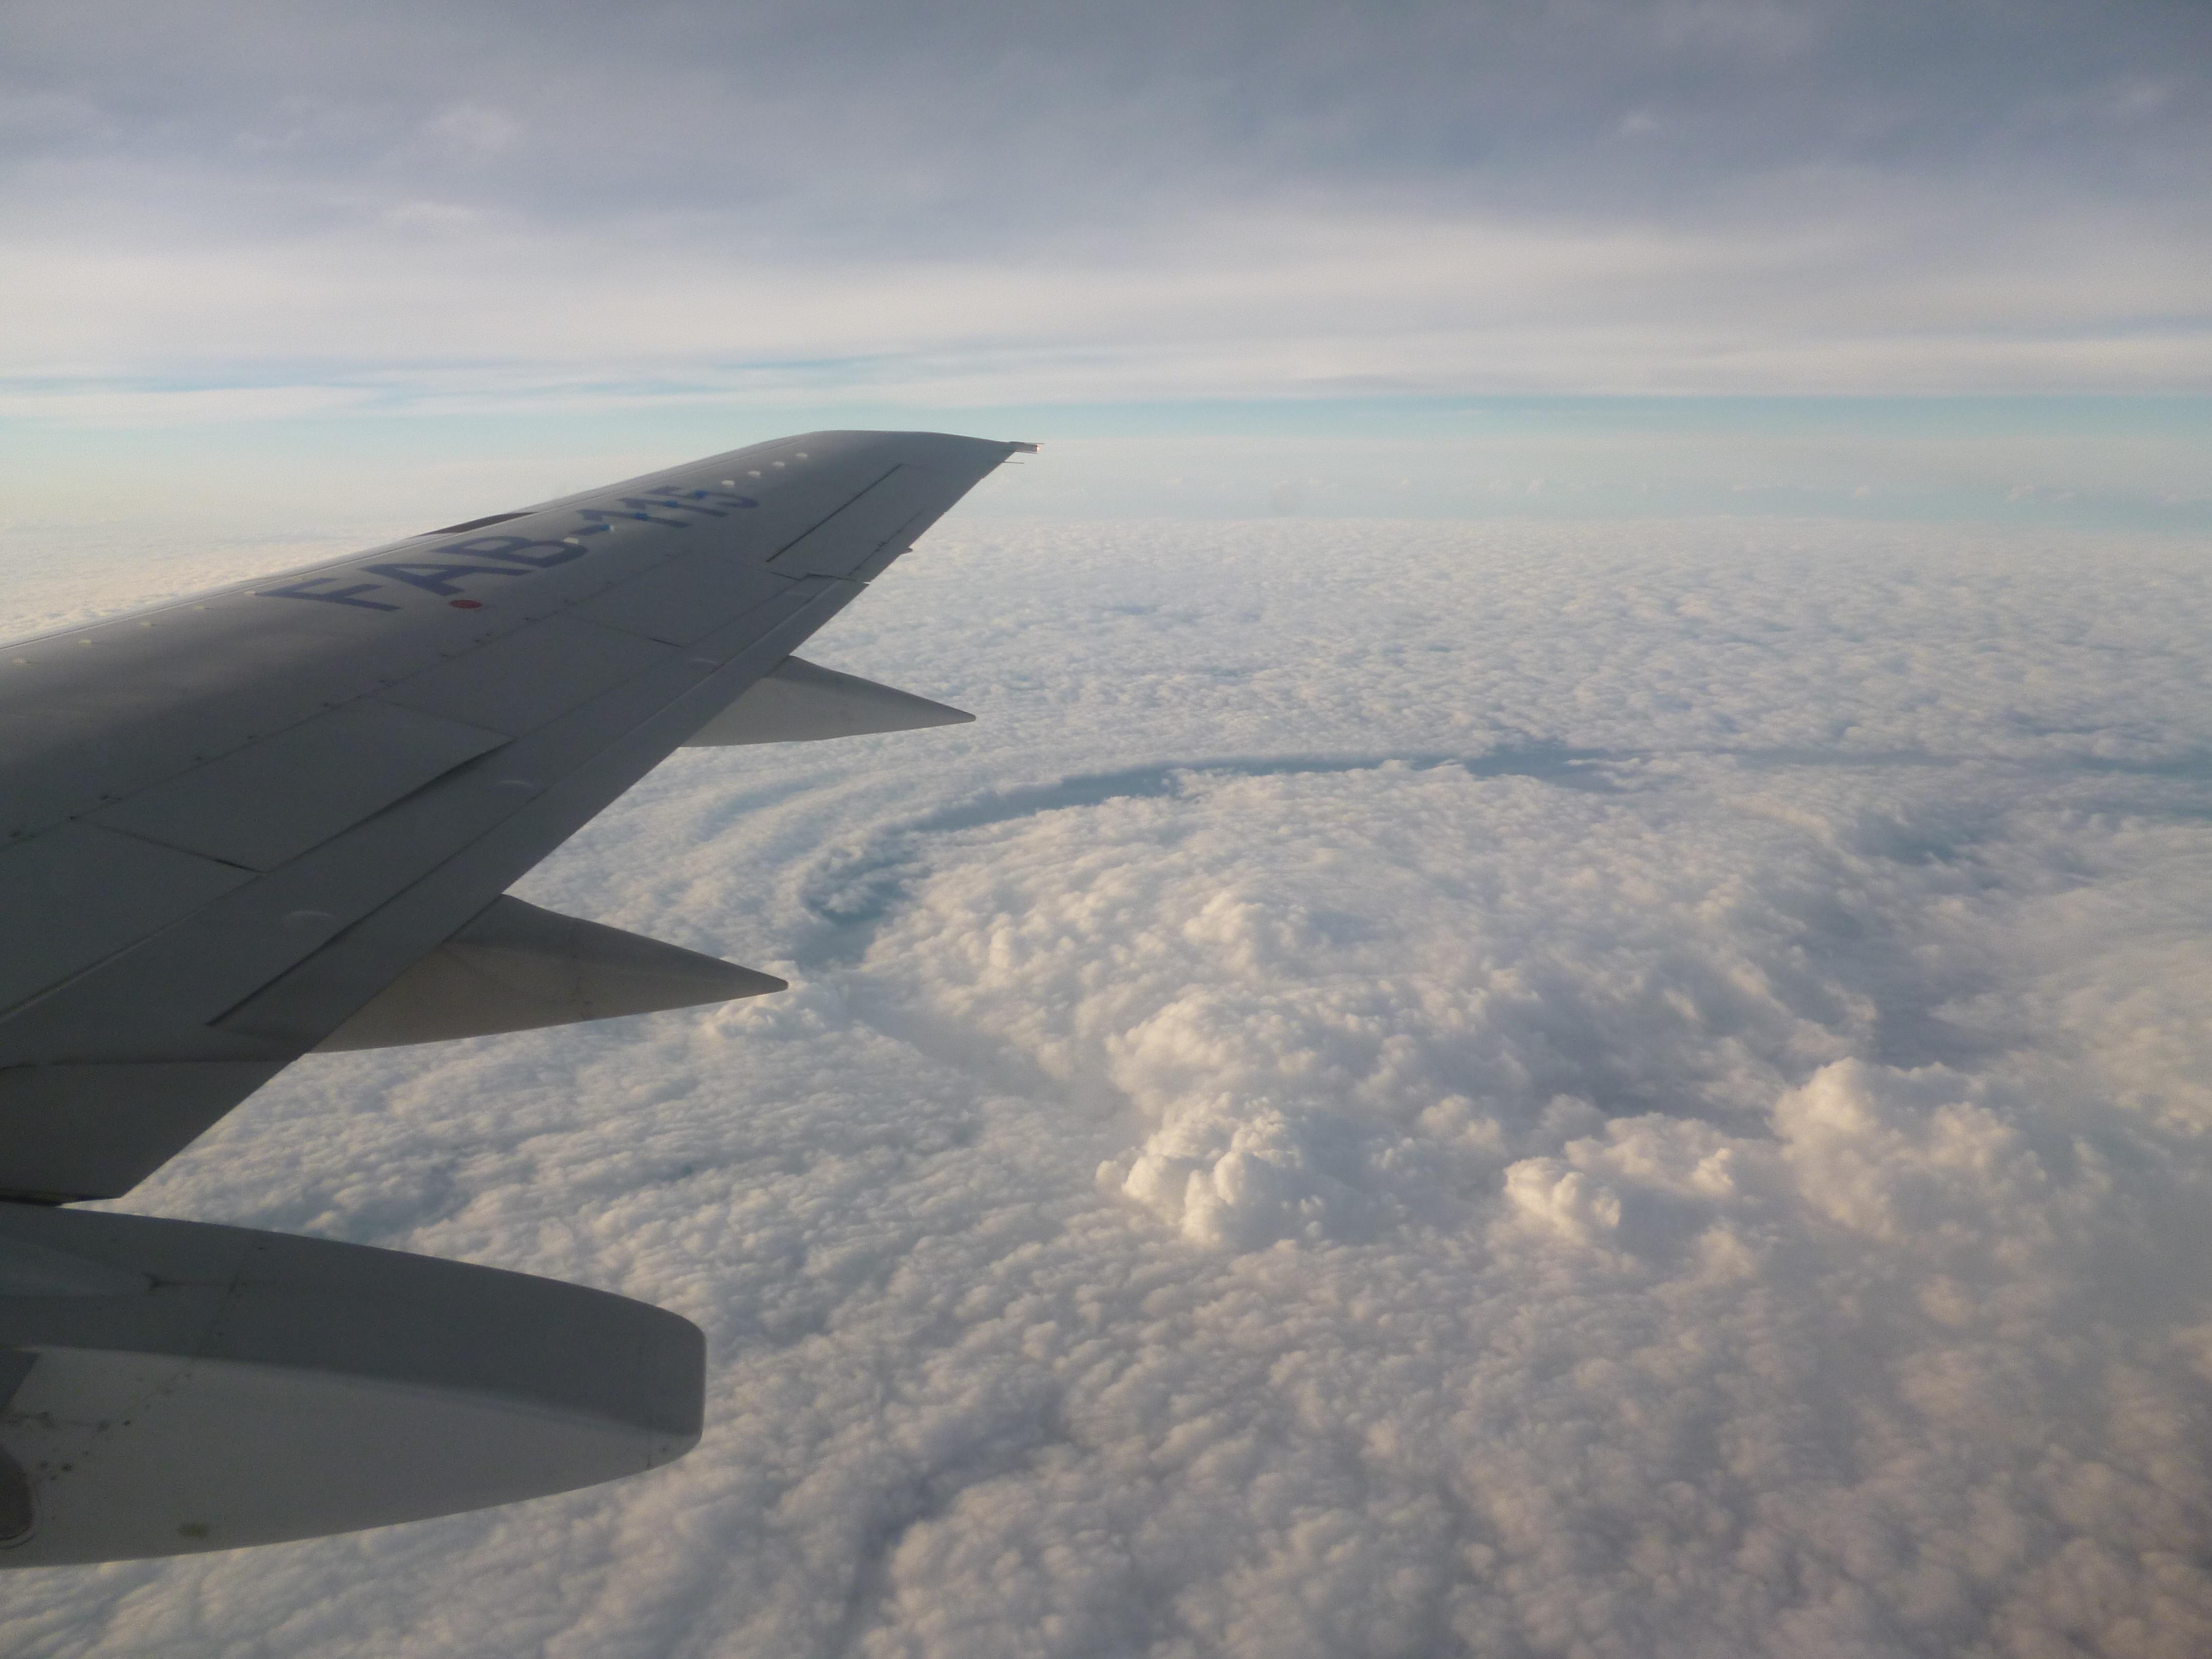 Gambar Pemandangan Sayap Awan Langit Pesawat Terbang